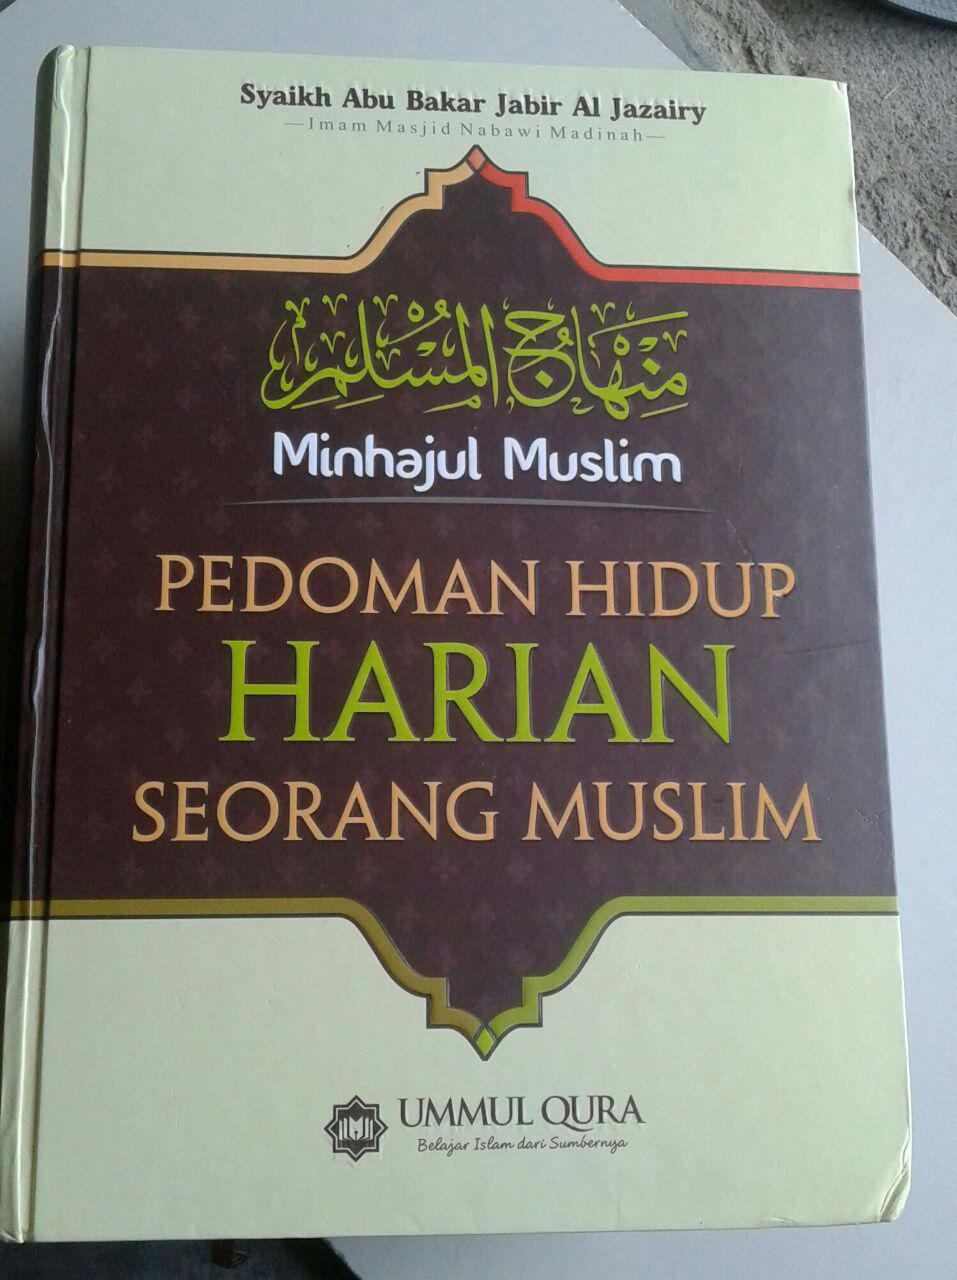 Buku Minhajul Muslim Pedoman Hidup Harian Seorang Muslim cover 2